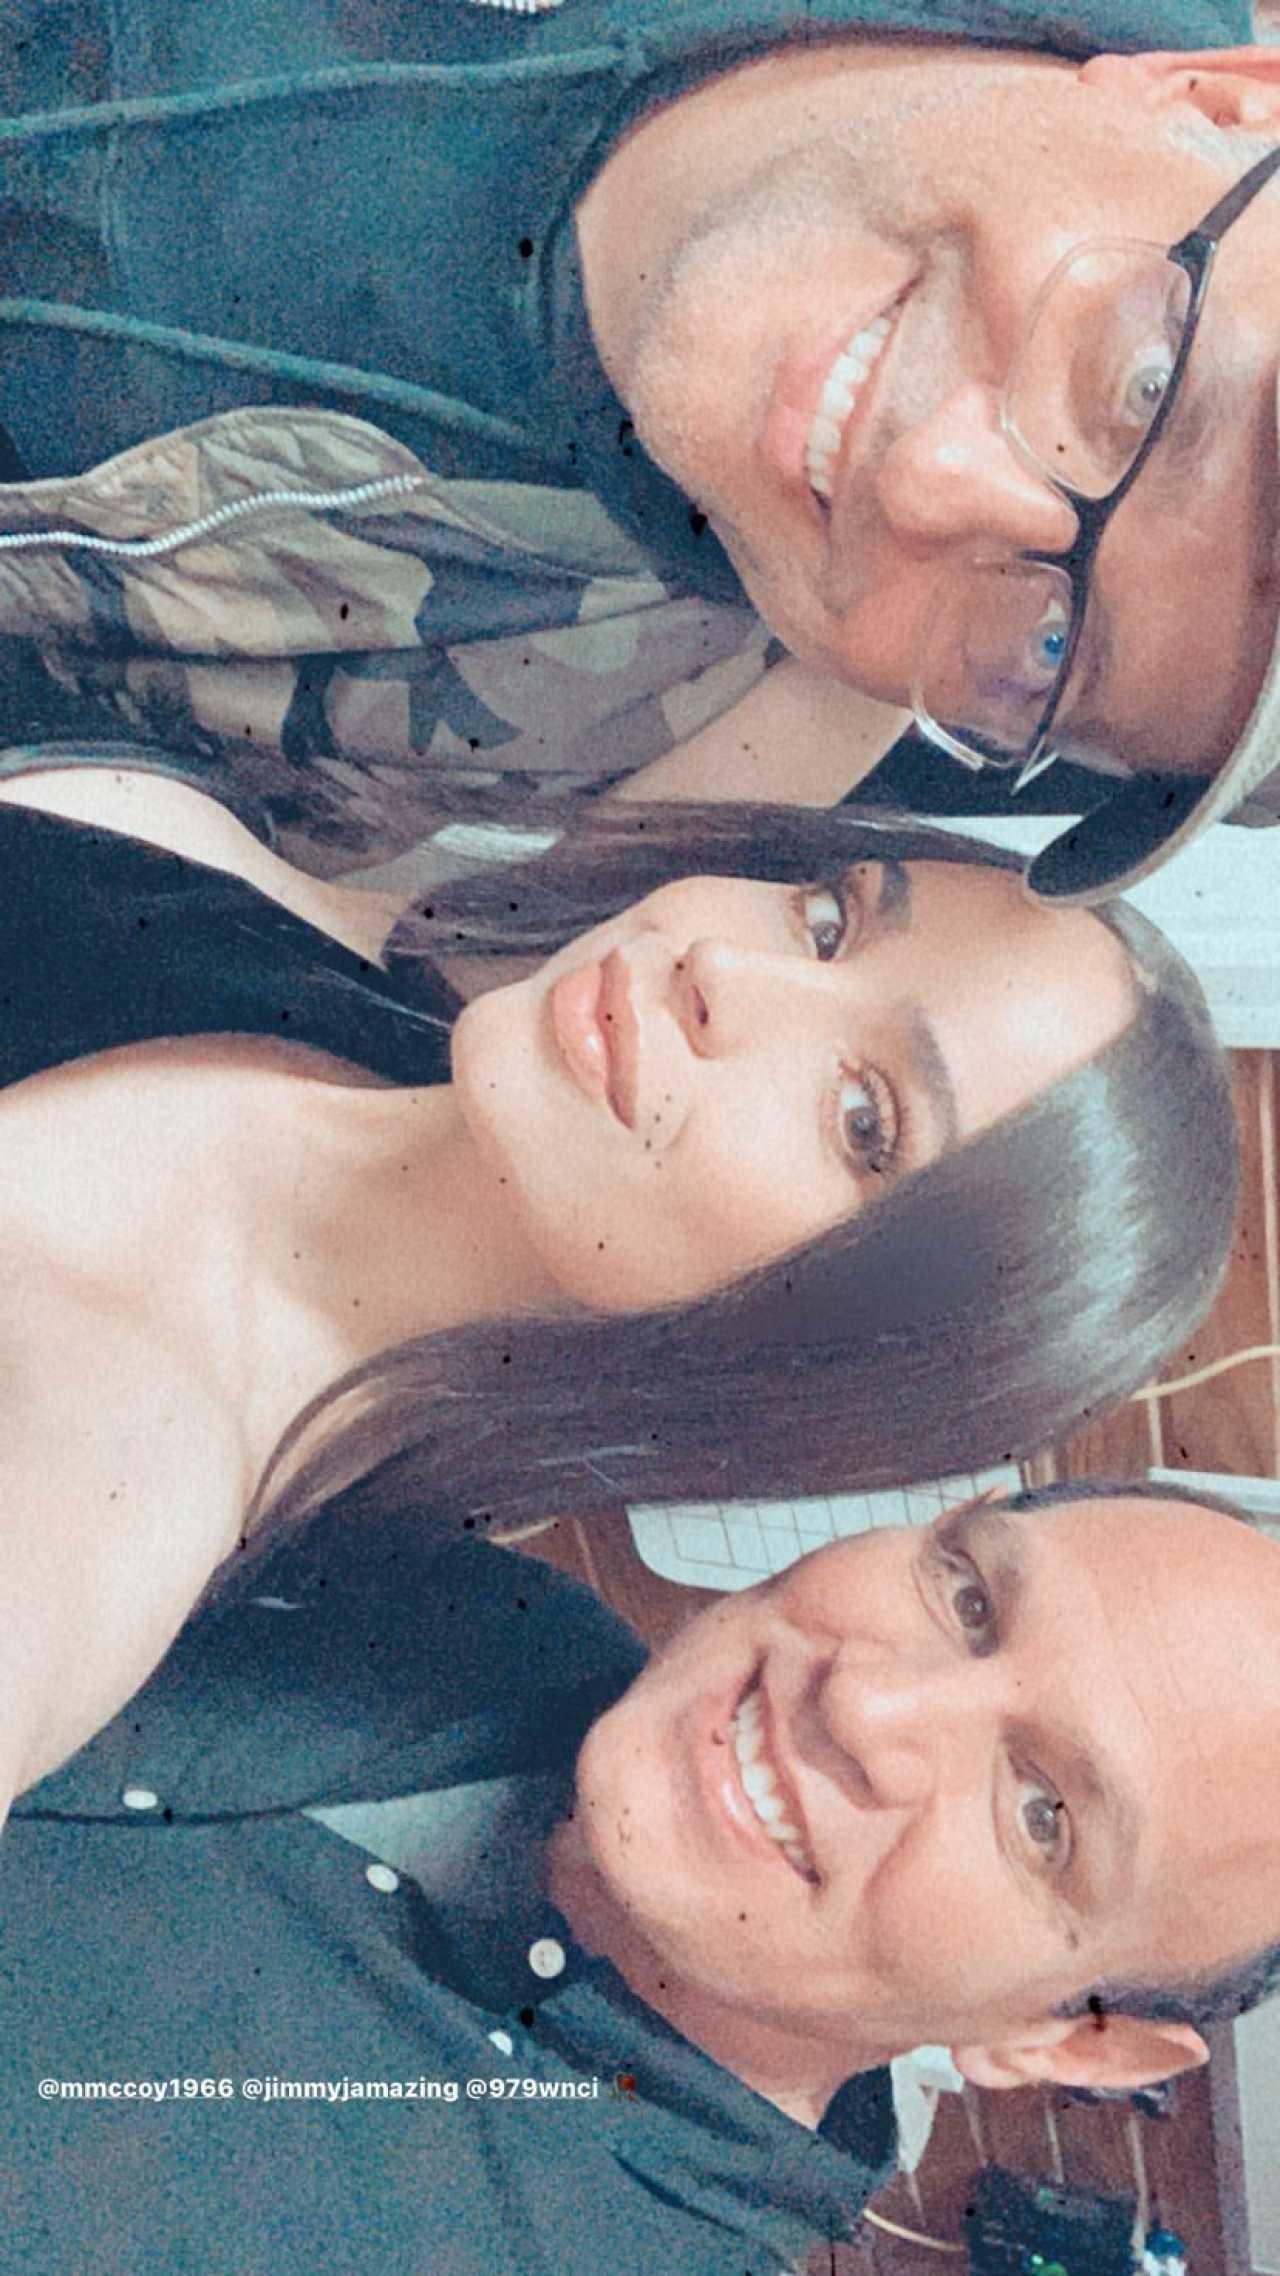 Sofia Carson 2020 : Sofia Carson – Instagram and social media pics-63